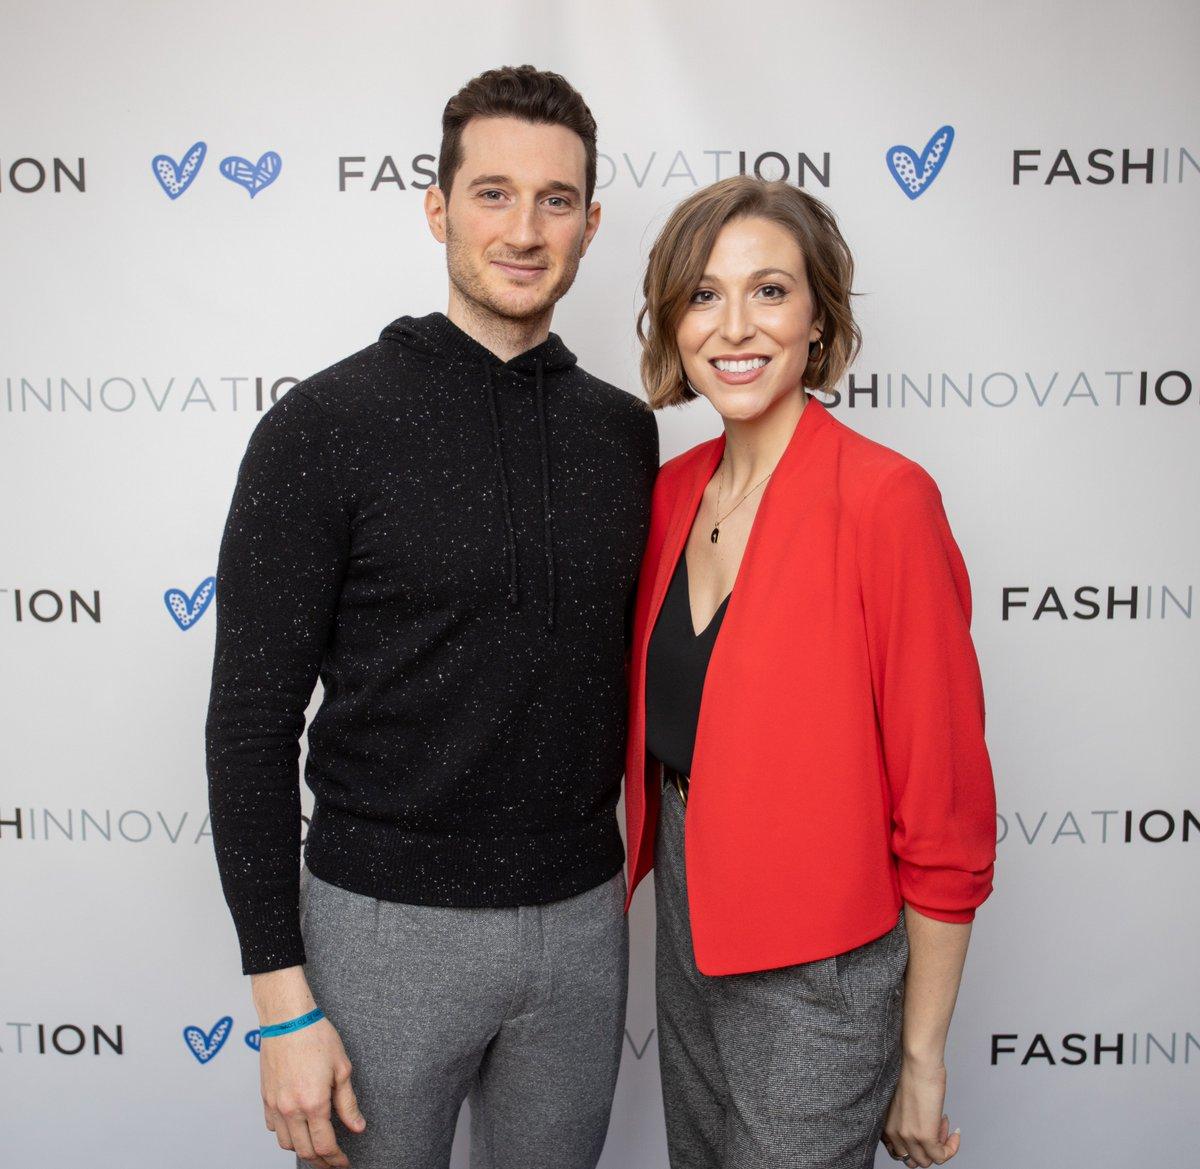 @Fashinnovation_ #FashionIsToLove #Fashinnovationpic.twitter.com/jd6rJEIVvE